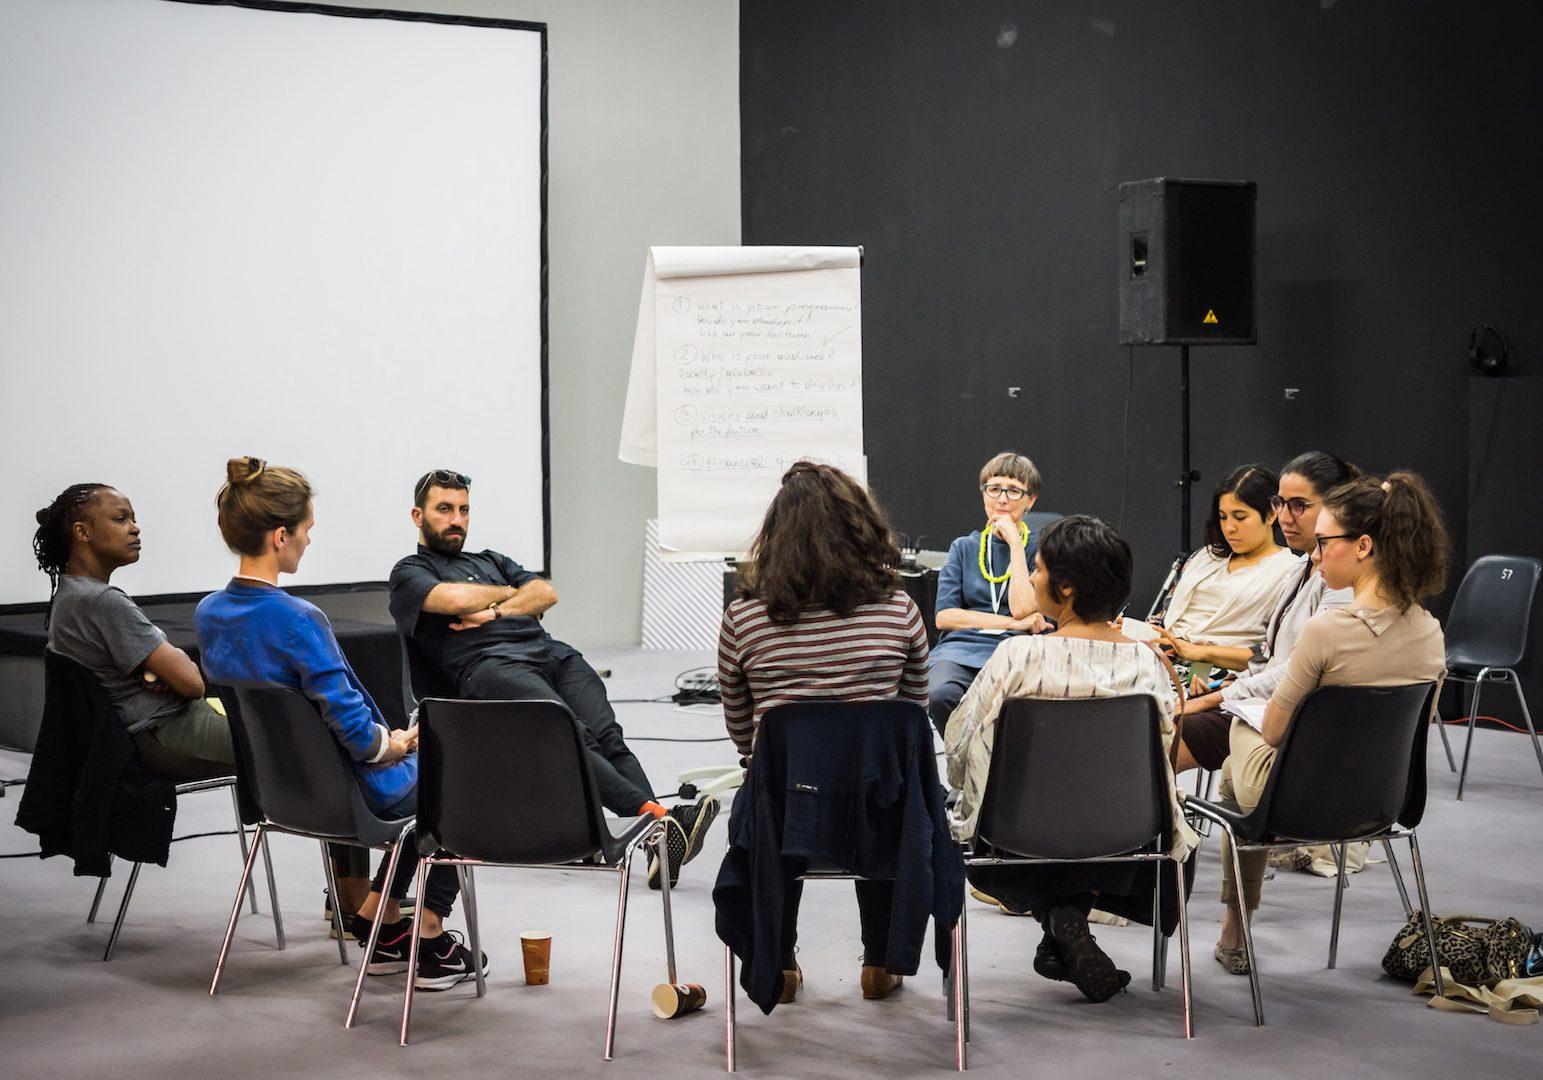 International Summer Academy Salzburg: Global Academy, Künstlerhaus Salzburg. Hildegund Amanshauser, Ahmet Öğüt, Koyo Kouoh, Diana Campbell Betancourt and Participants. Courtesy of the International Summer Academy Salzburg: